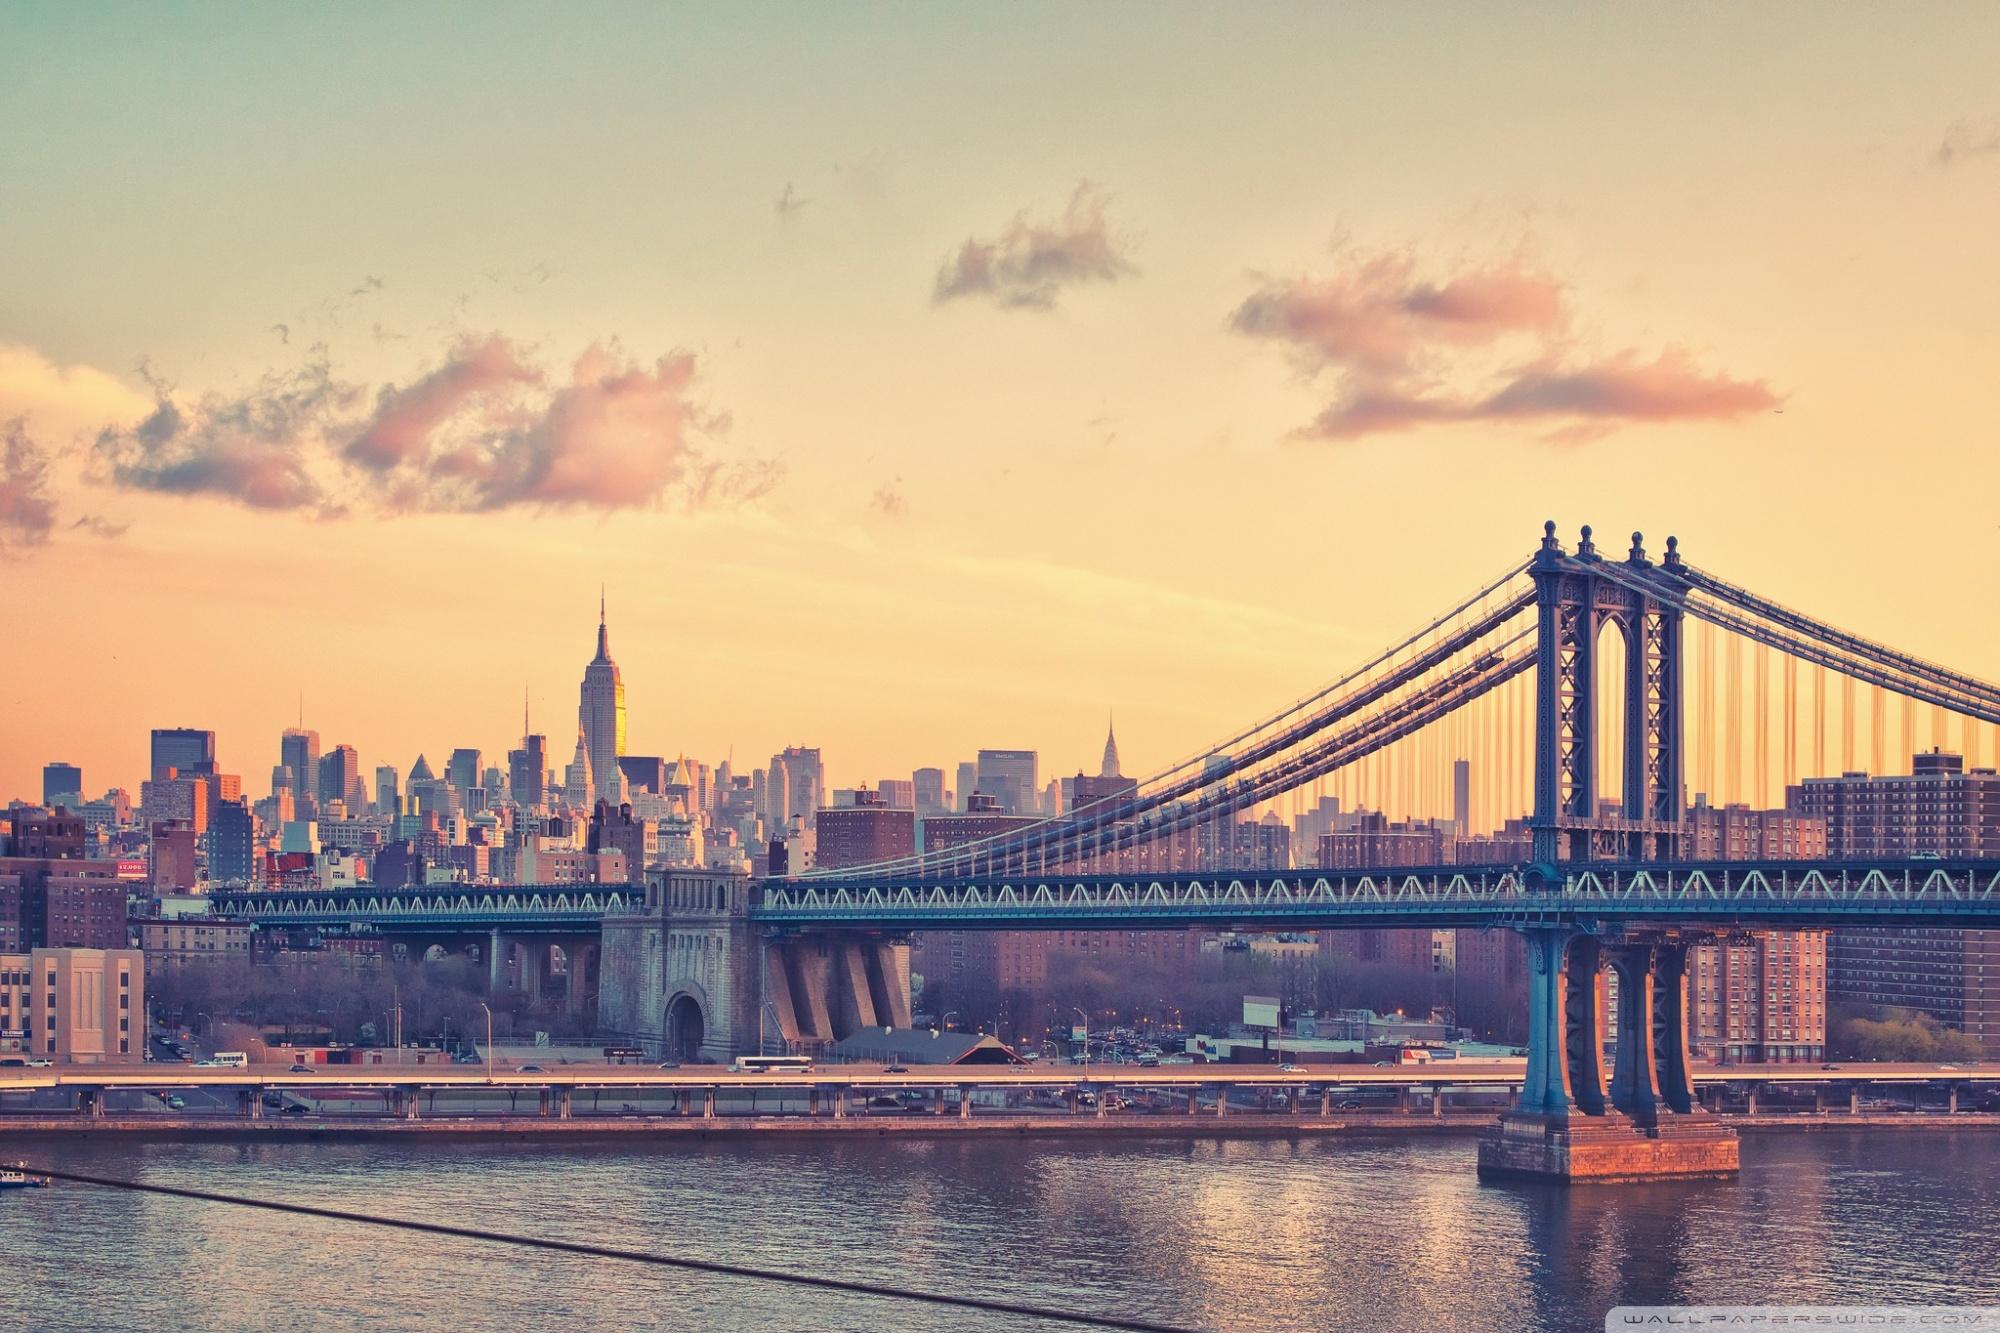 Bay Bridge New York 4K HD Desktop Wallpaper for 4K Ultra HD TV 2000x1333